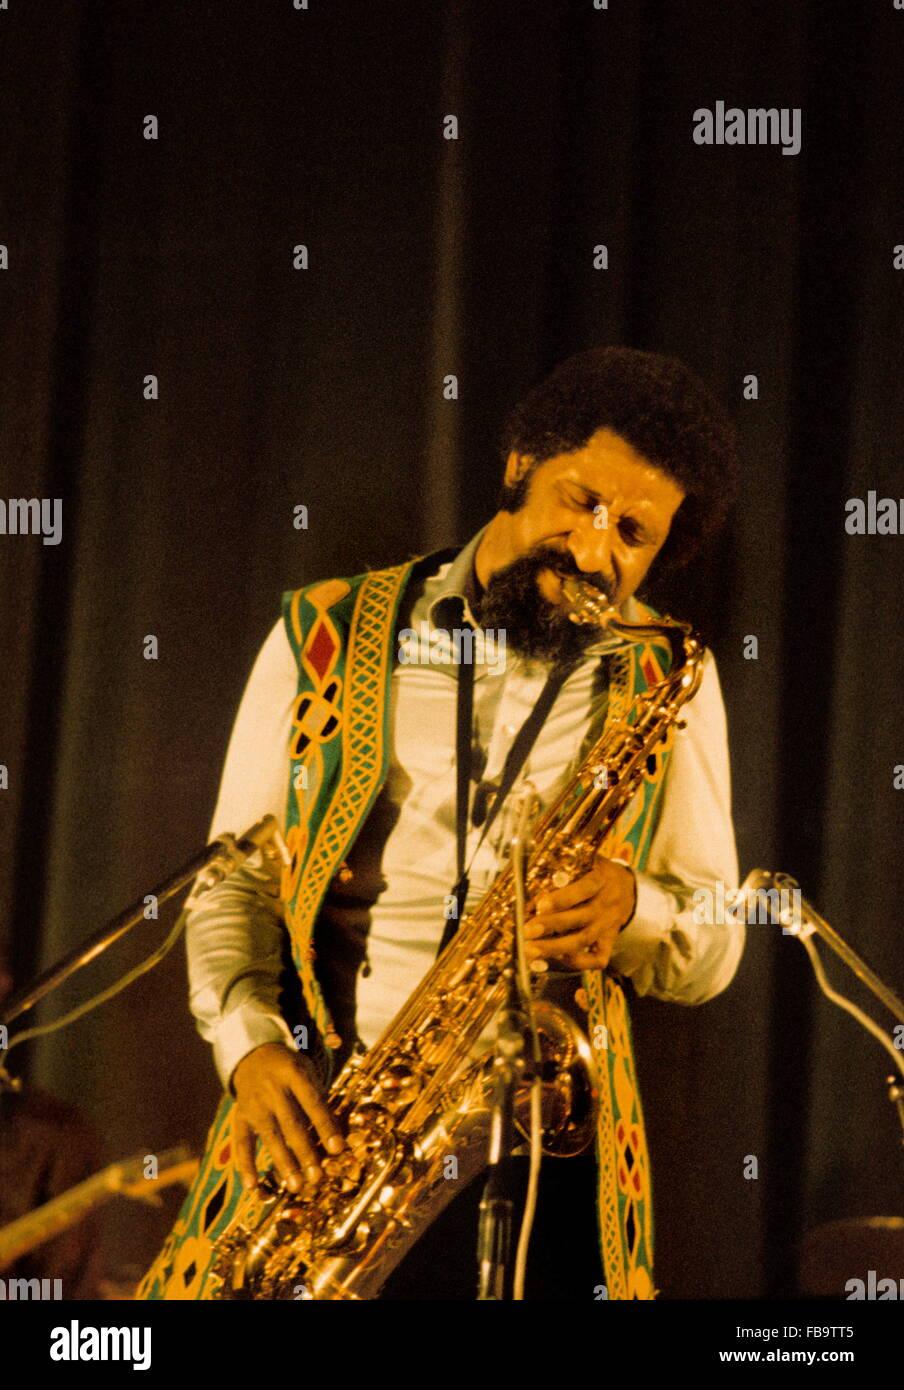 The saxophone player Sonny ROLLINS. -  1974  -  France / Ile-de-France (region) / Paris  -  The saxophone player - Stock Image